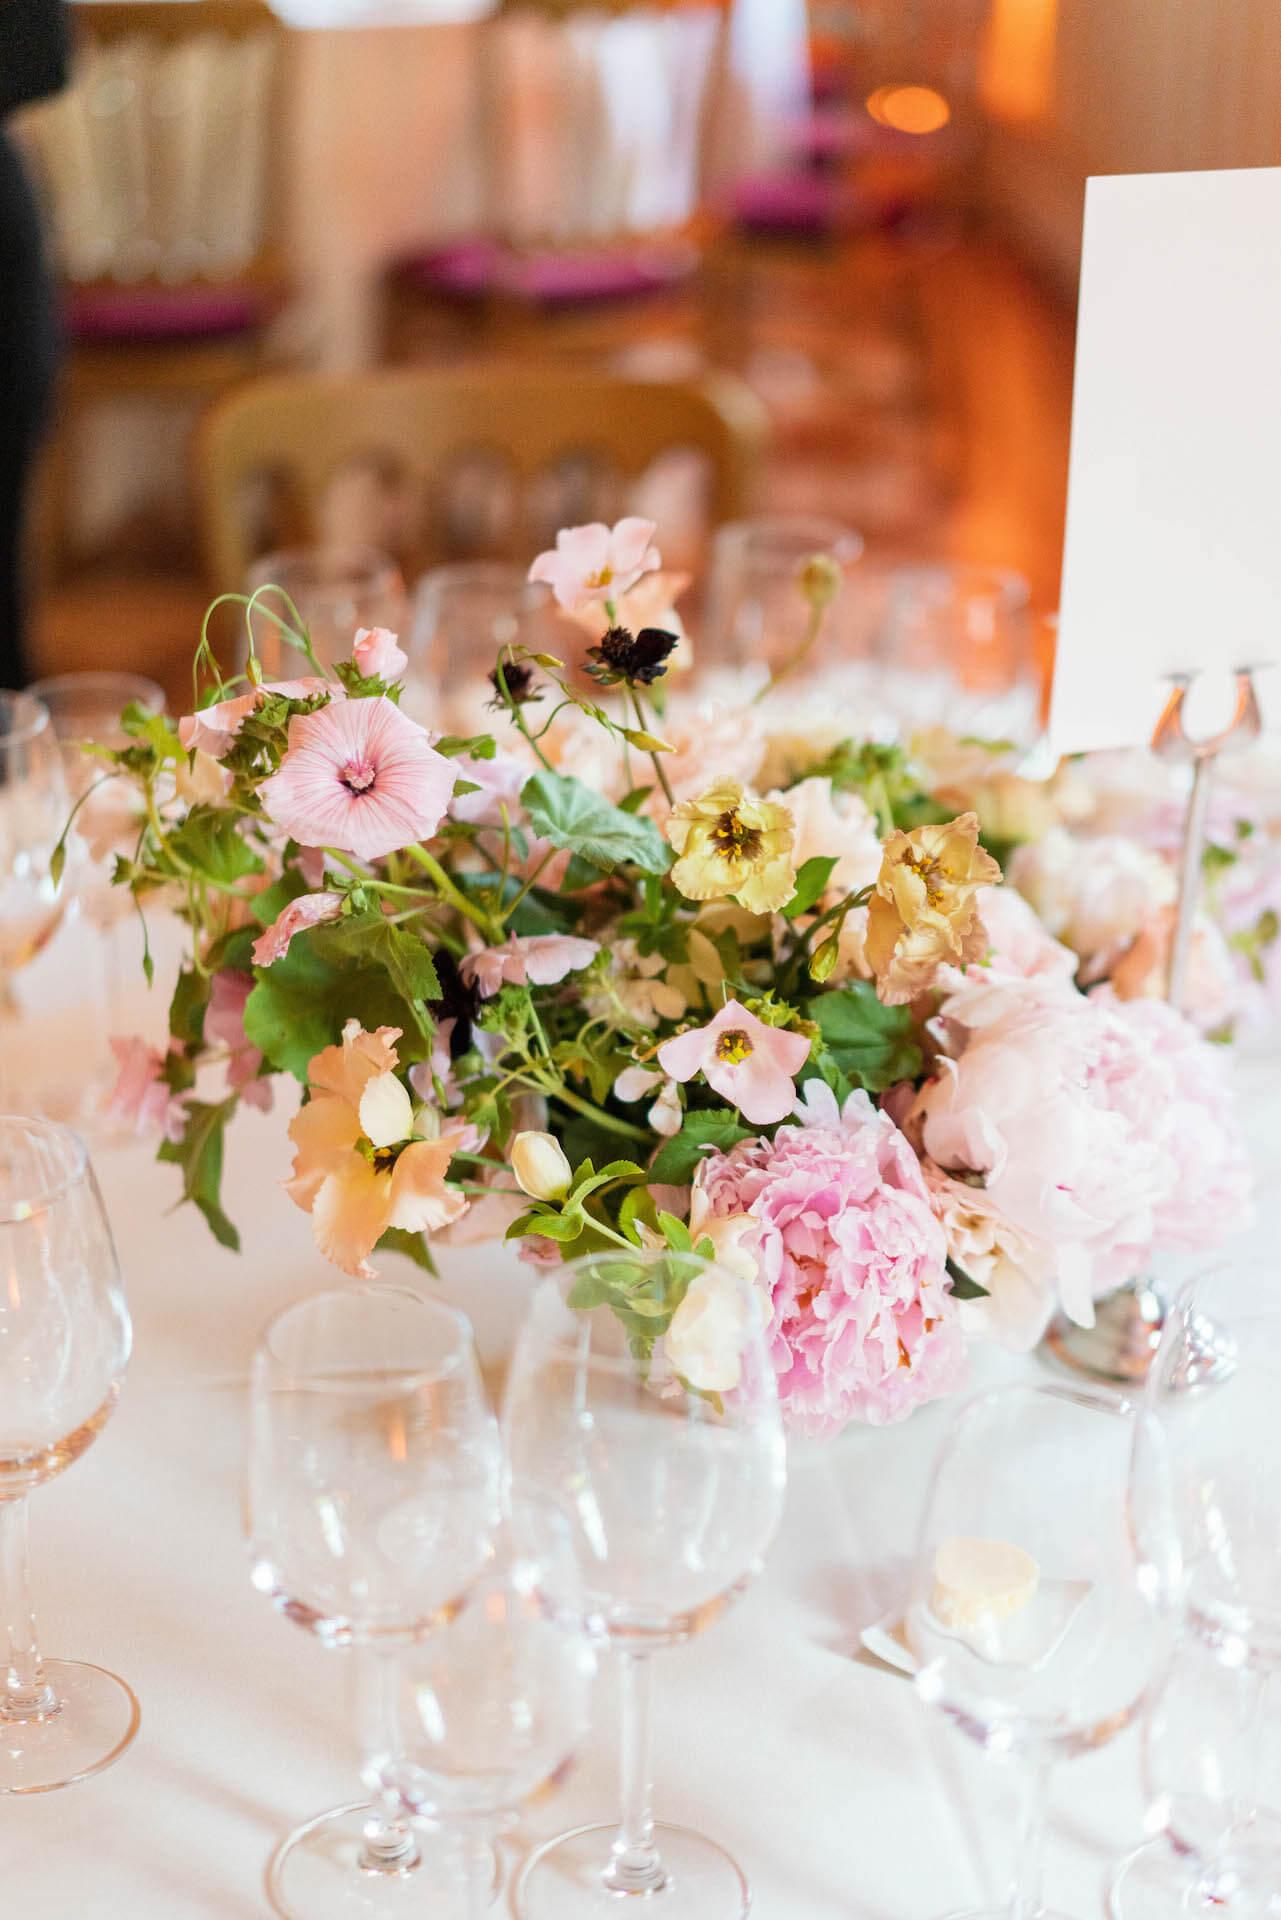 Peony and wild flowers wedding centrepiece